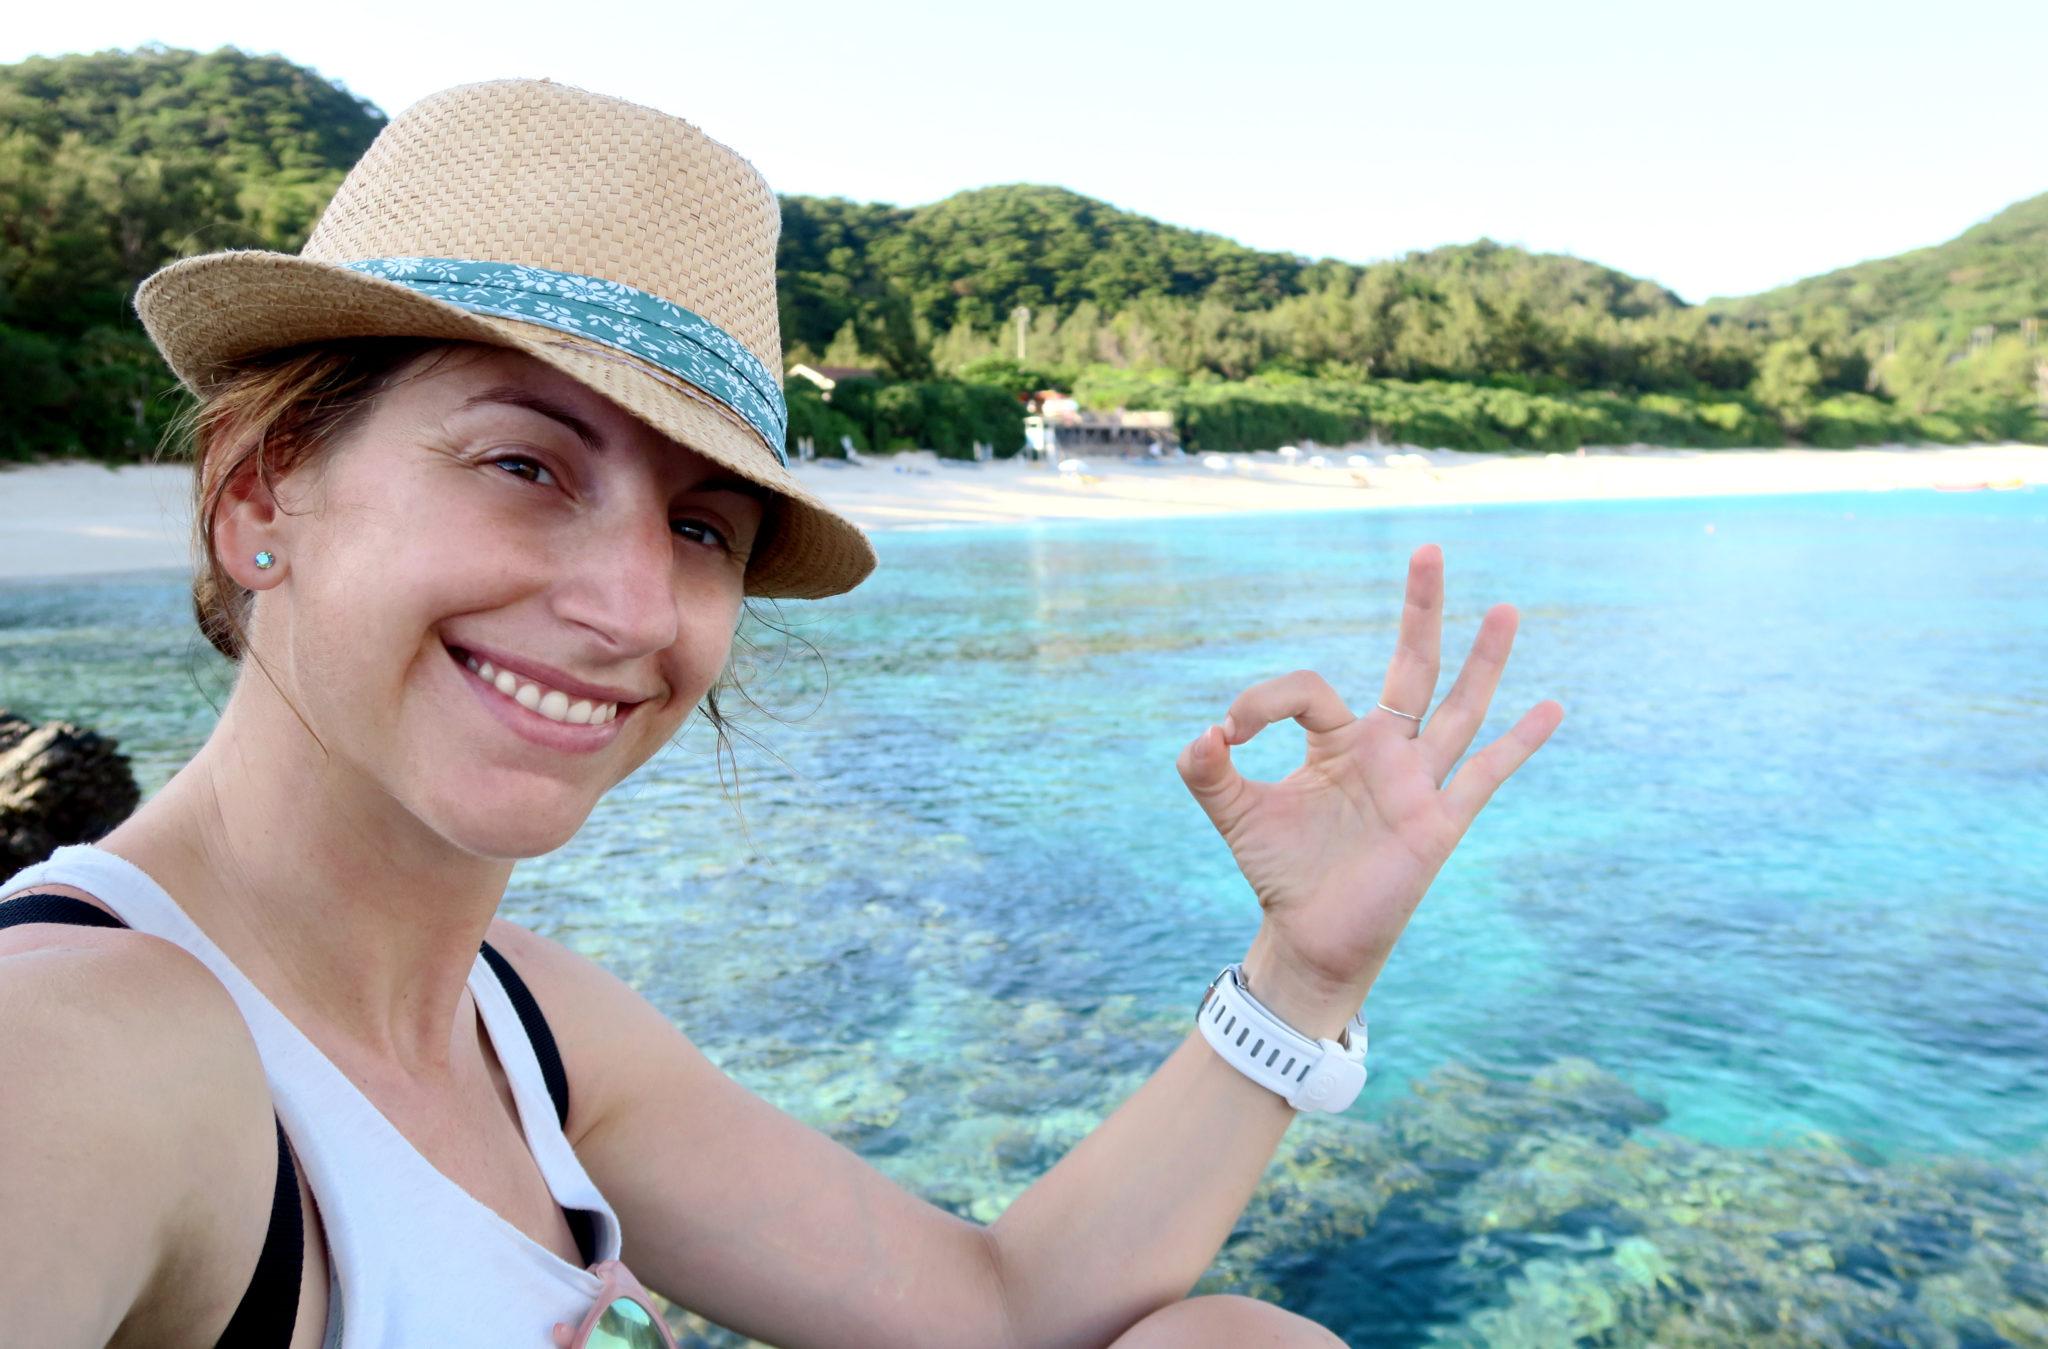 Florine Zamami Island Kerama National Park Okinawa Japan